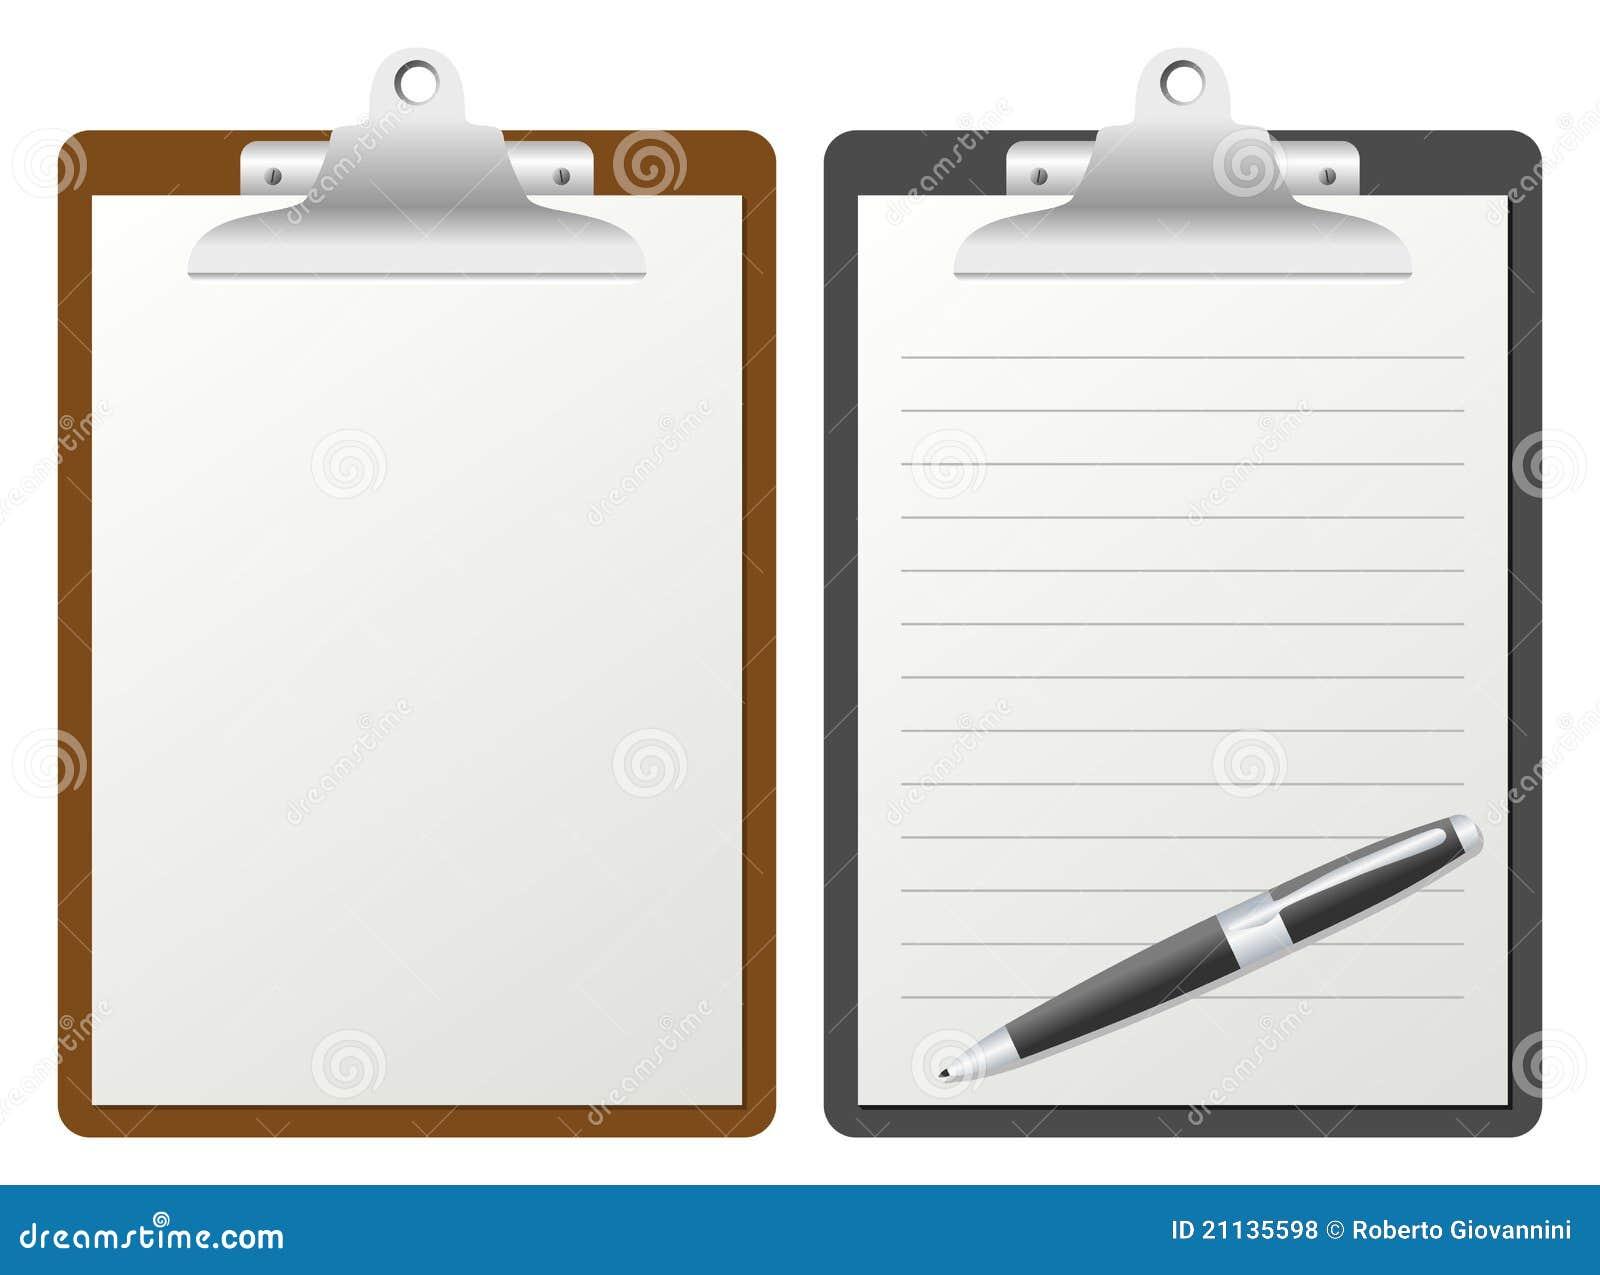 clipboard templates